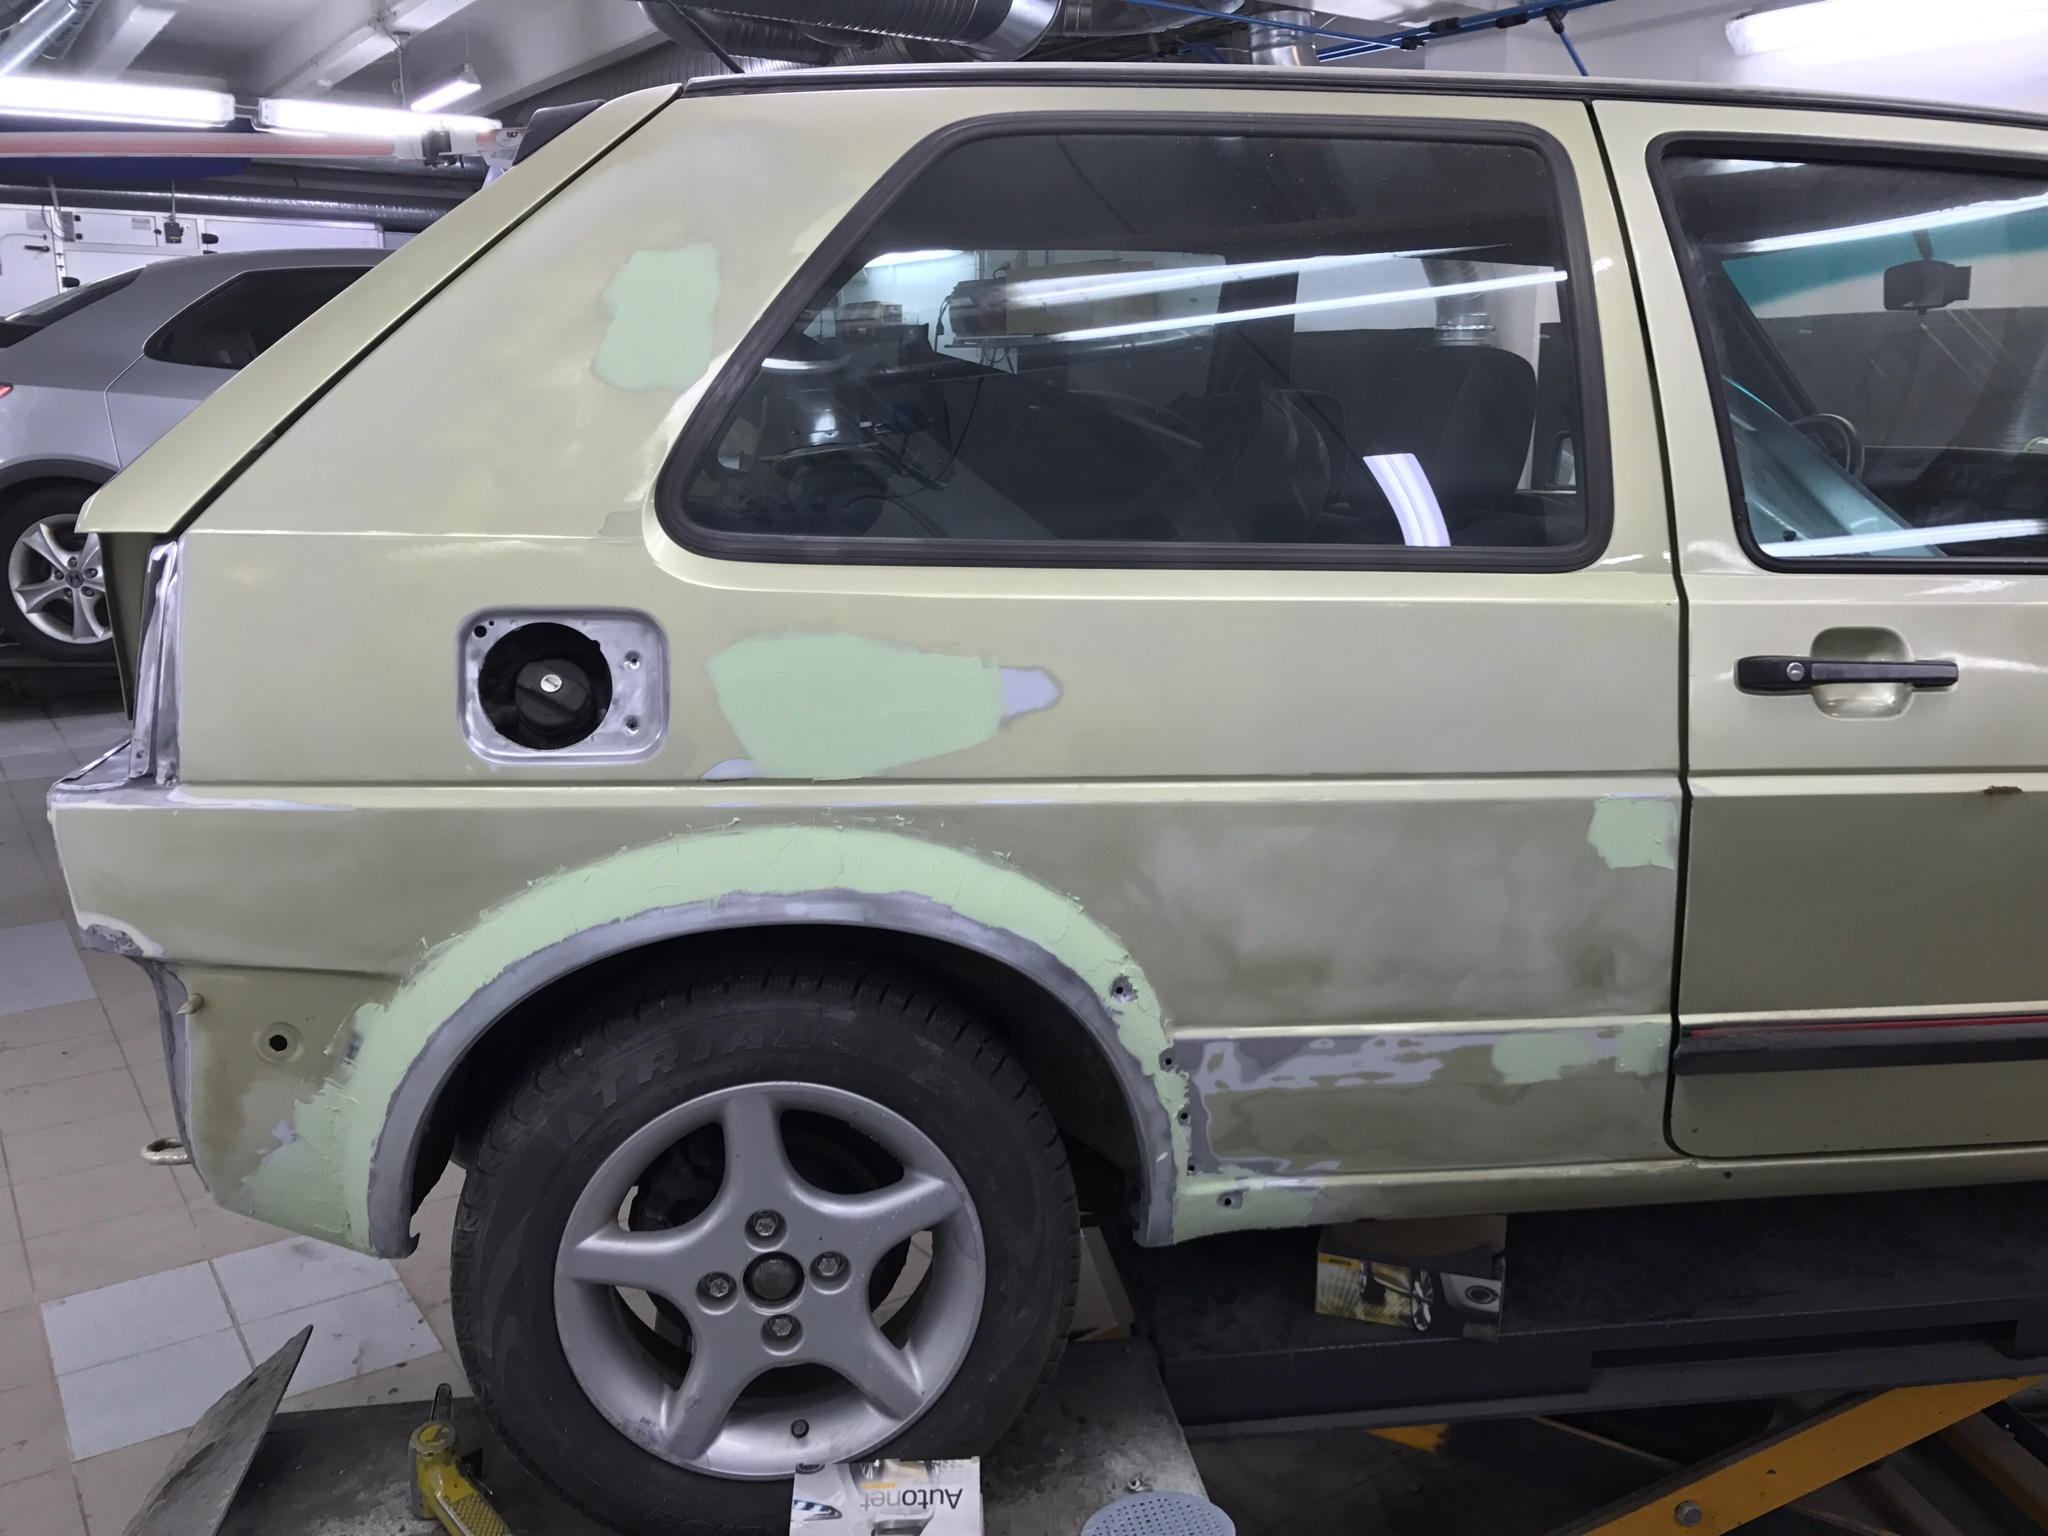 vwvortex com my 1986 golf mk2 3 doors gti 16v kr racing green rh forums vwvortex com 1992 VW GTI 16V Rally Car VW GTI 16V Samco Sport